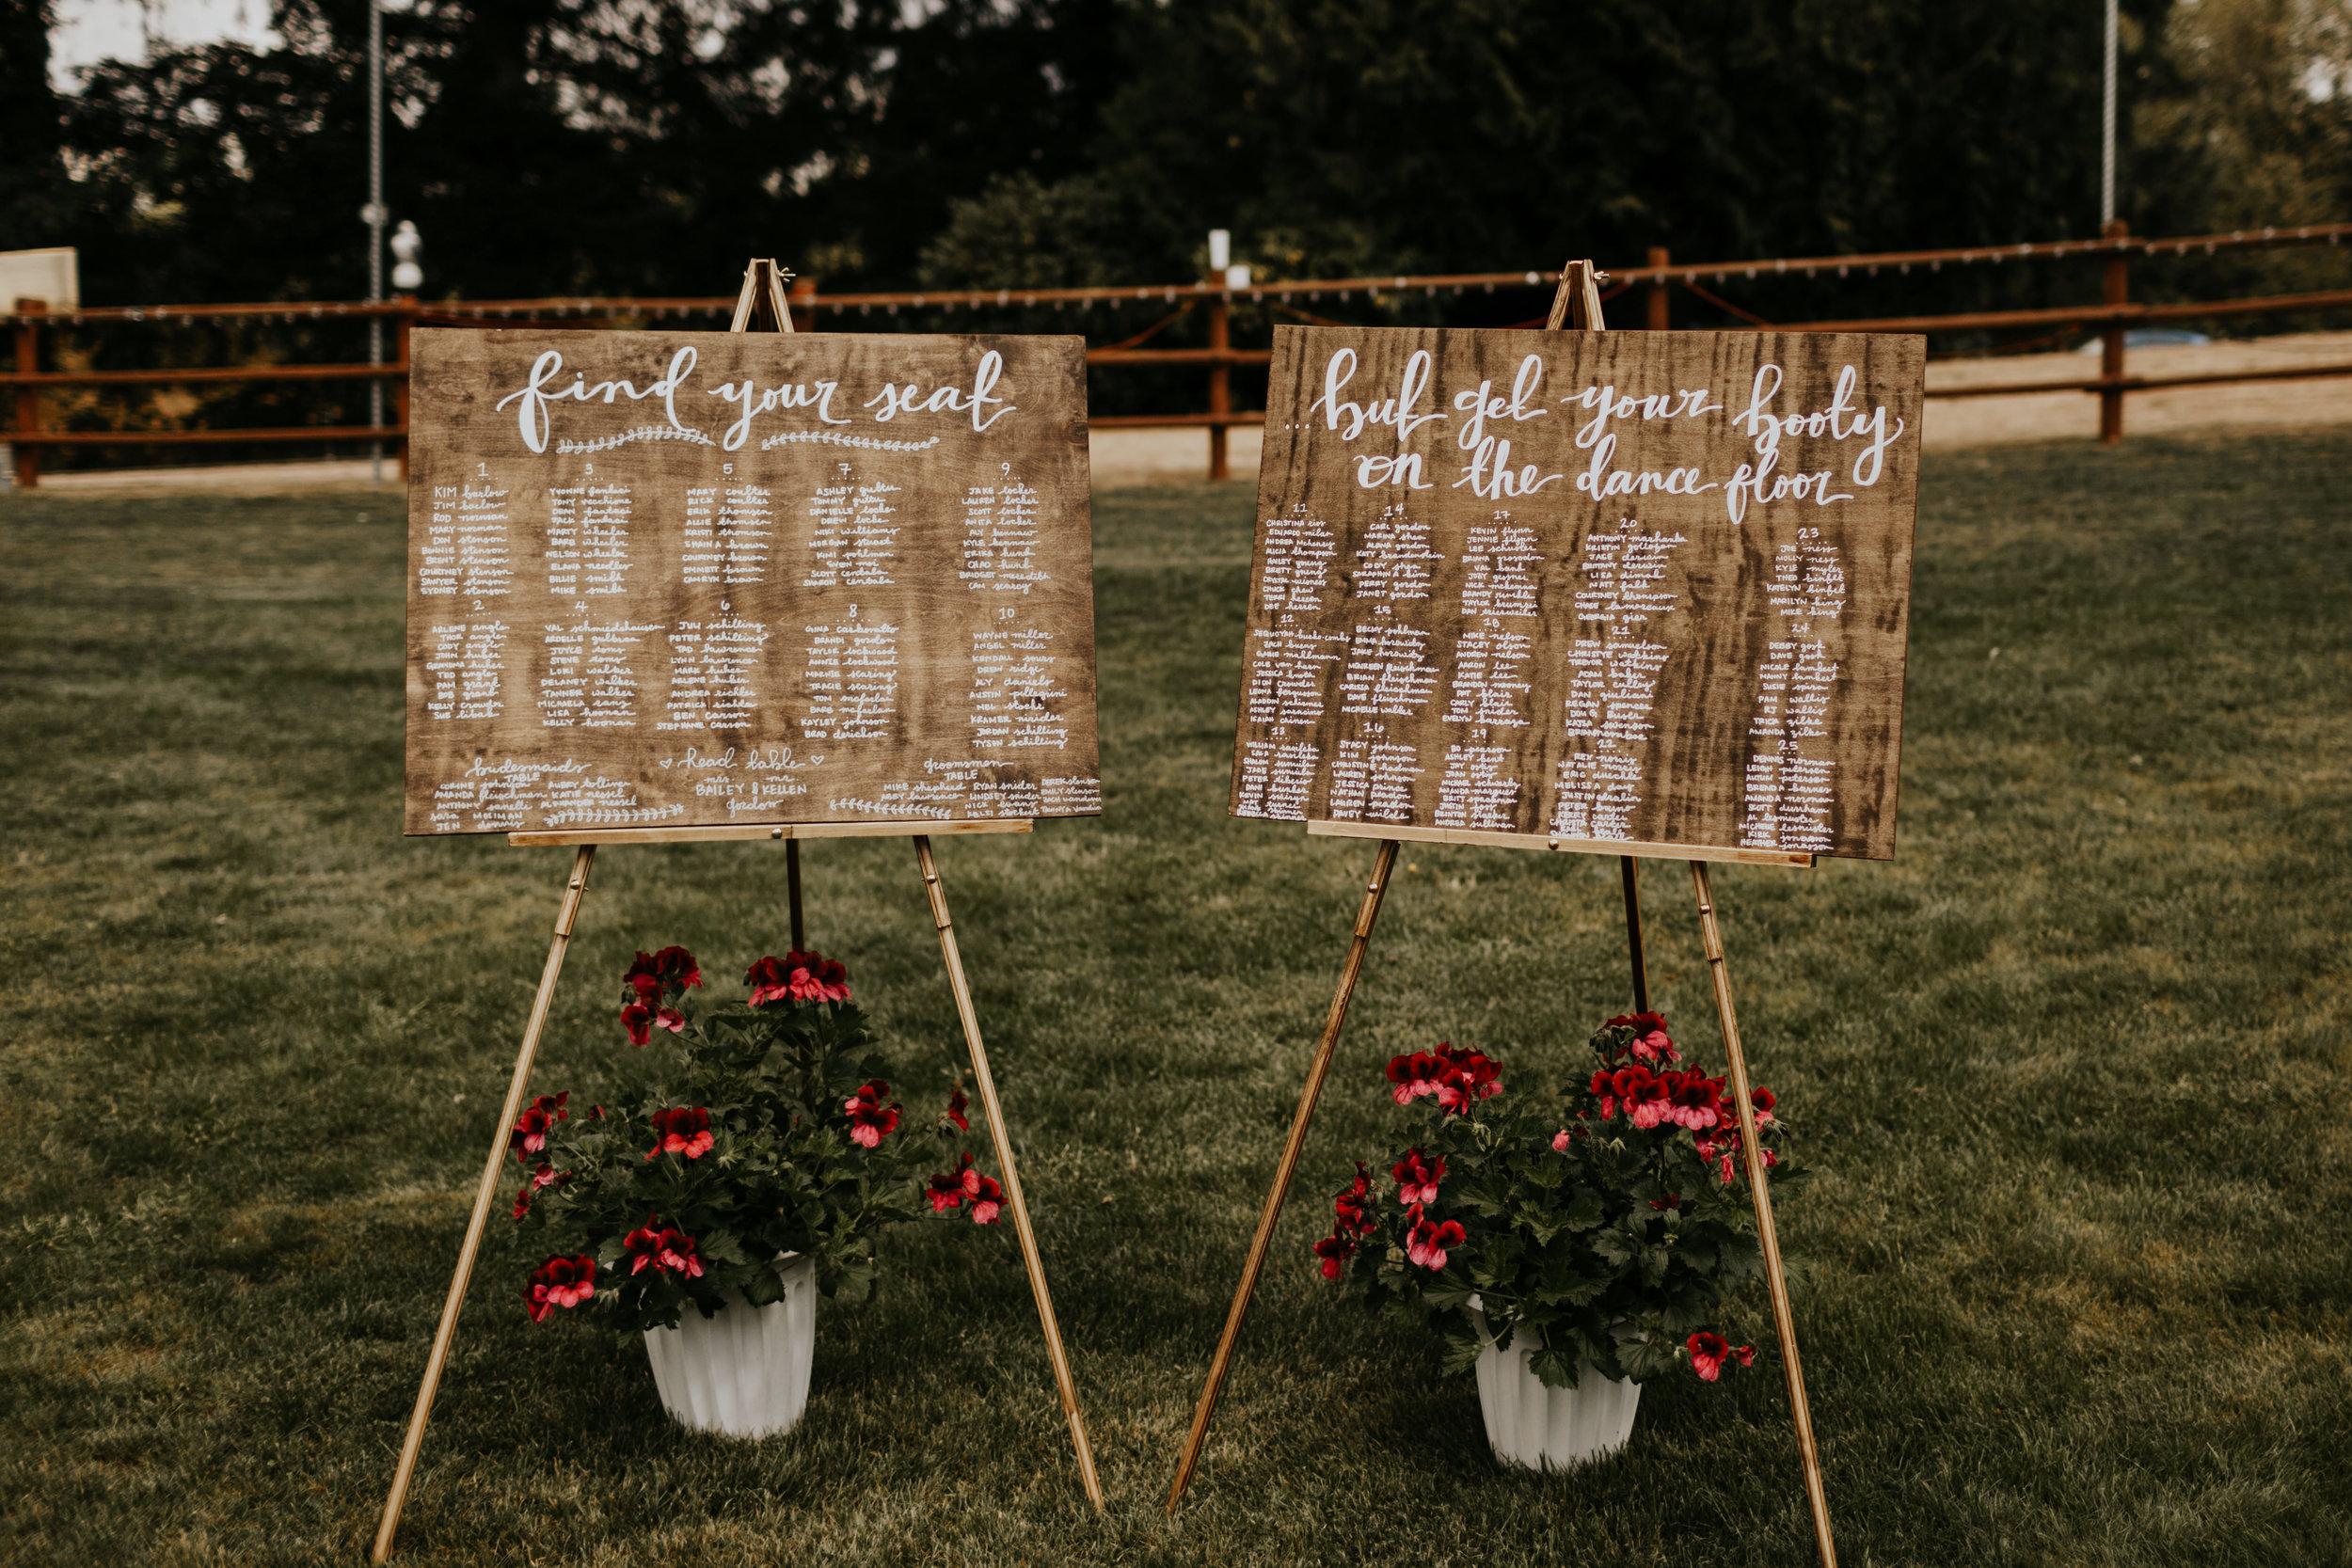 ginapaulson_baileykellen_wedding-1.jpg